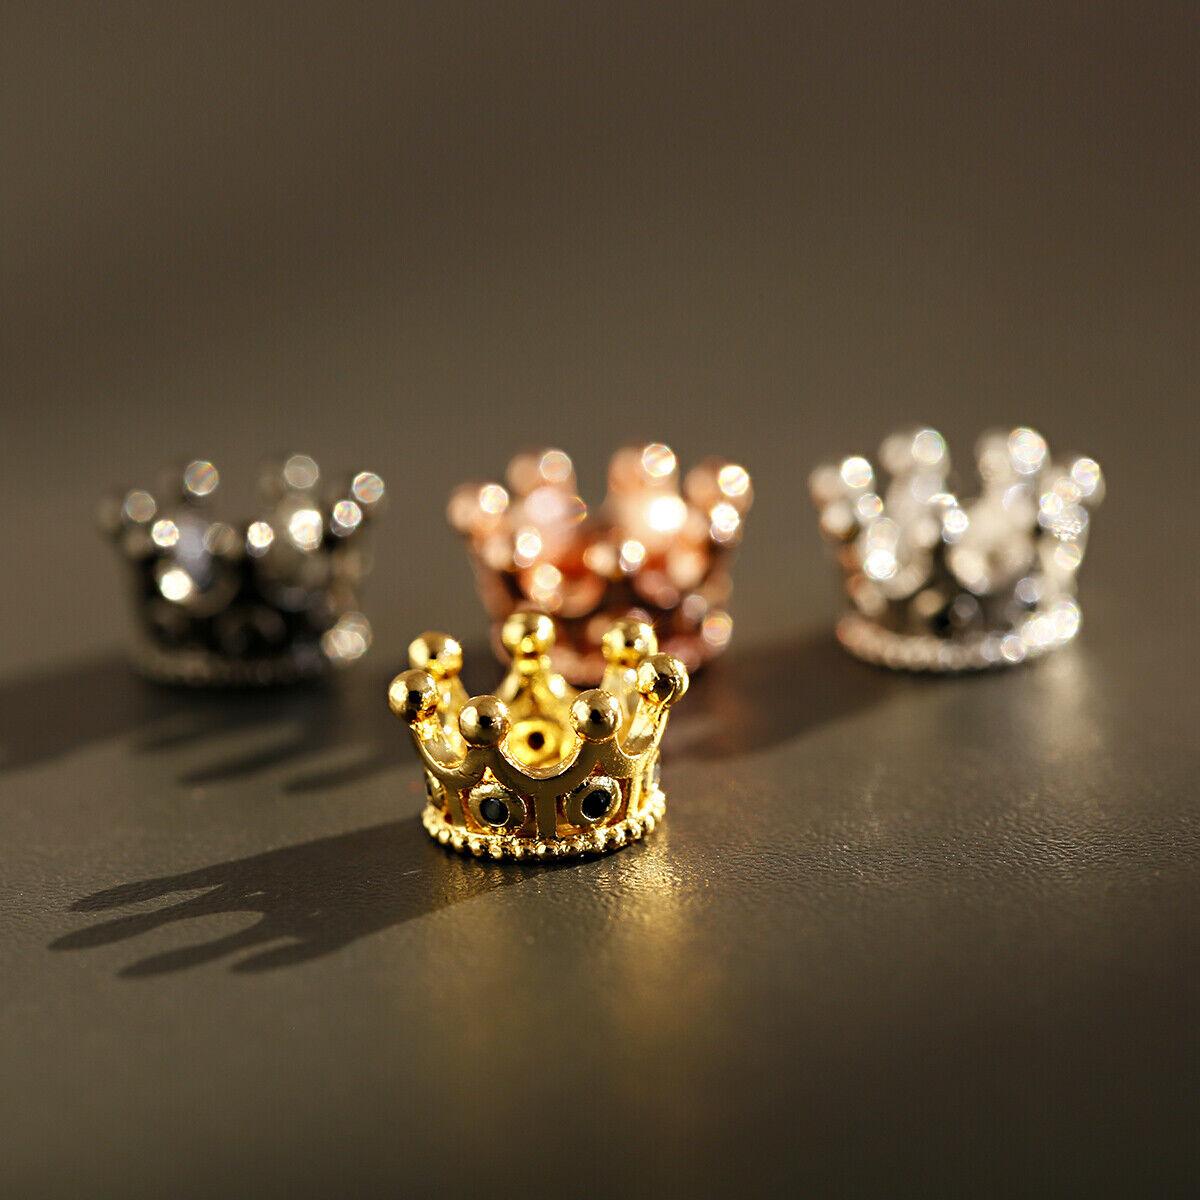 Zircon Gemstones Pave Queen Crown Bracelet Brass Copper Connector Charm Beads 5